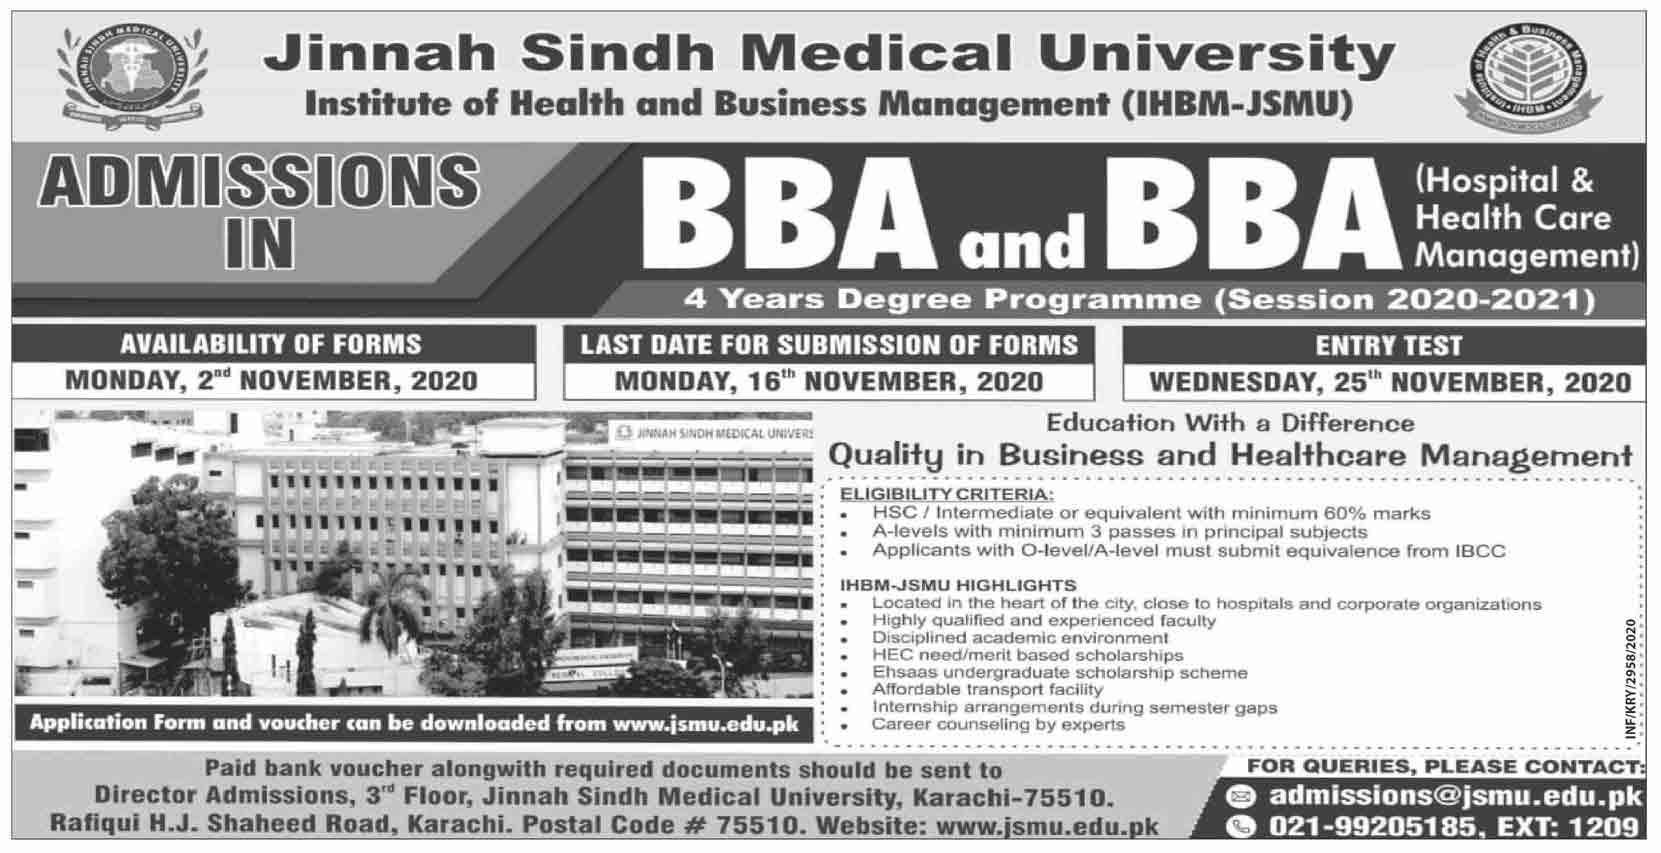 Jinnah-Sindh-Medical-University-Admission-2020